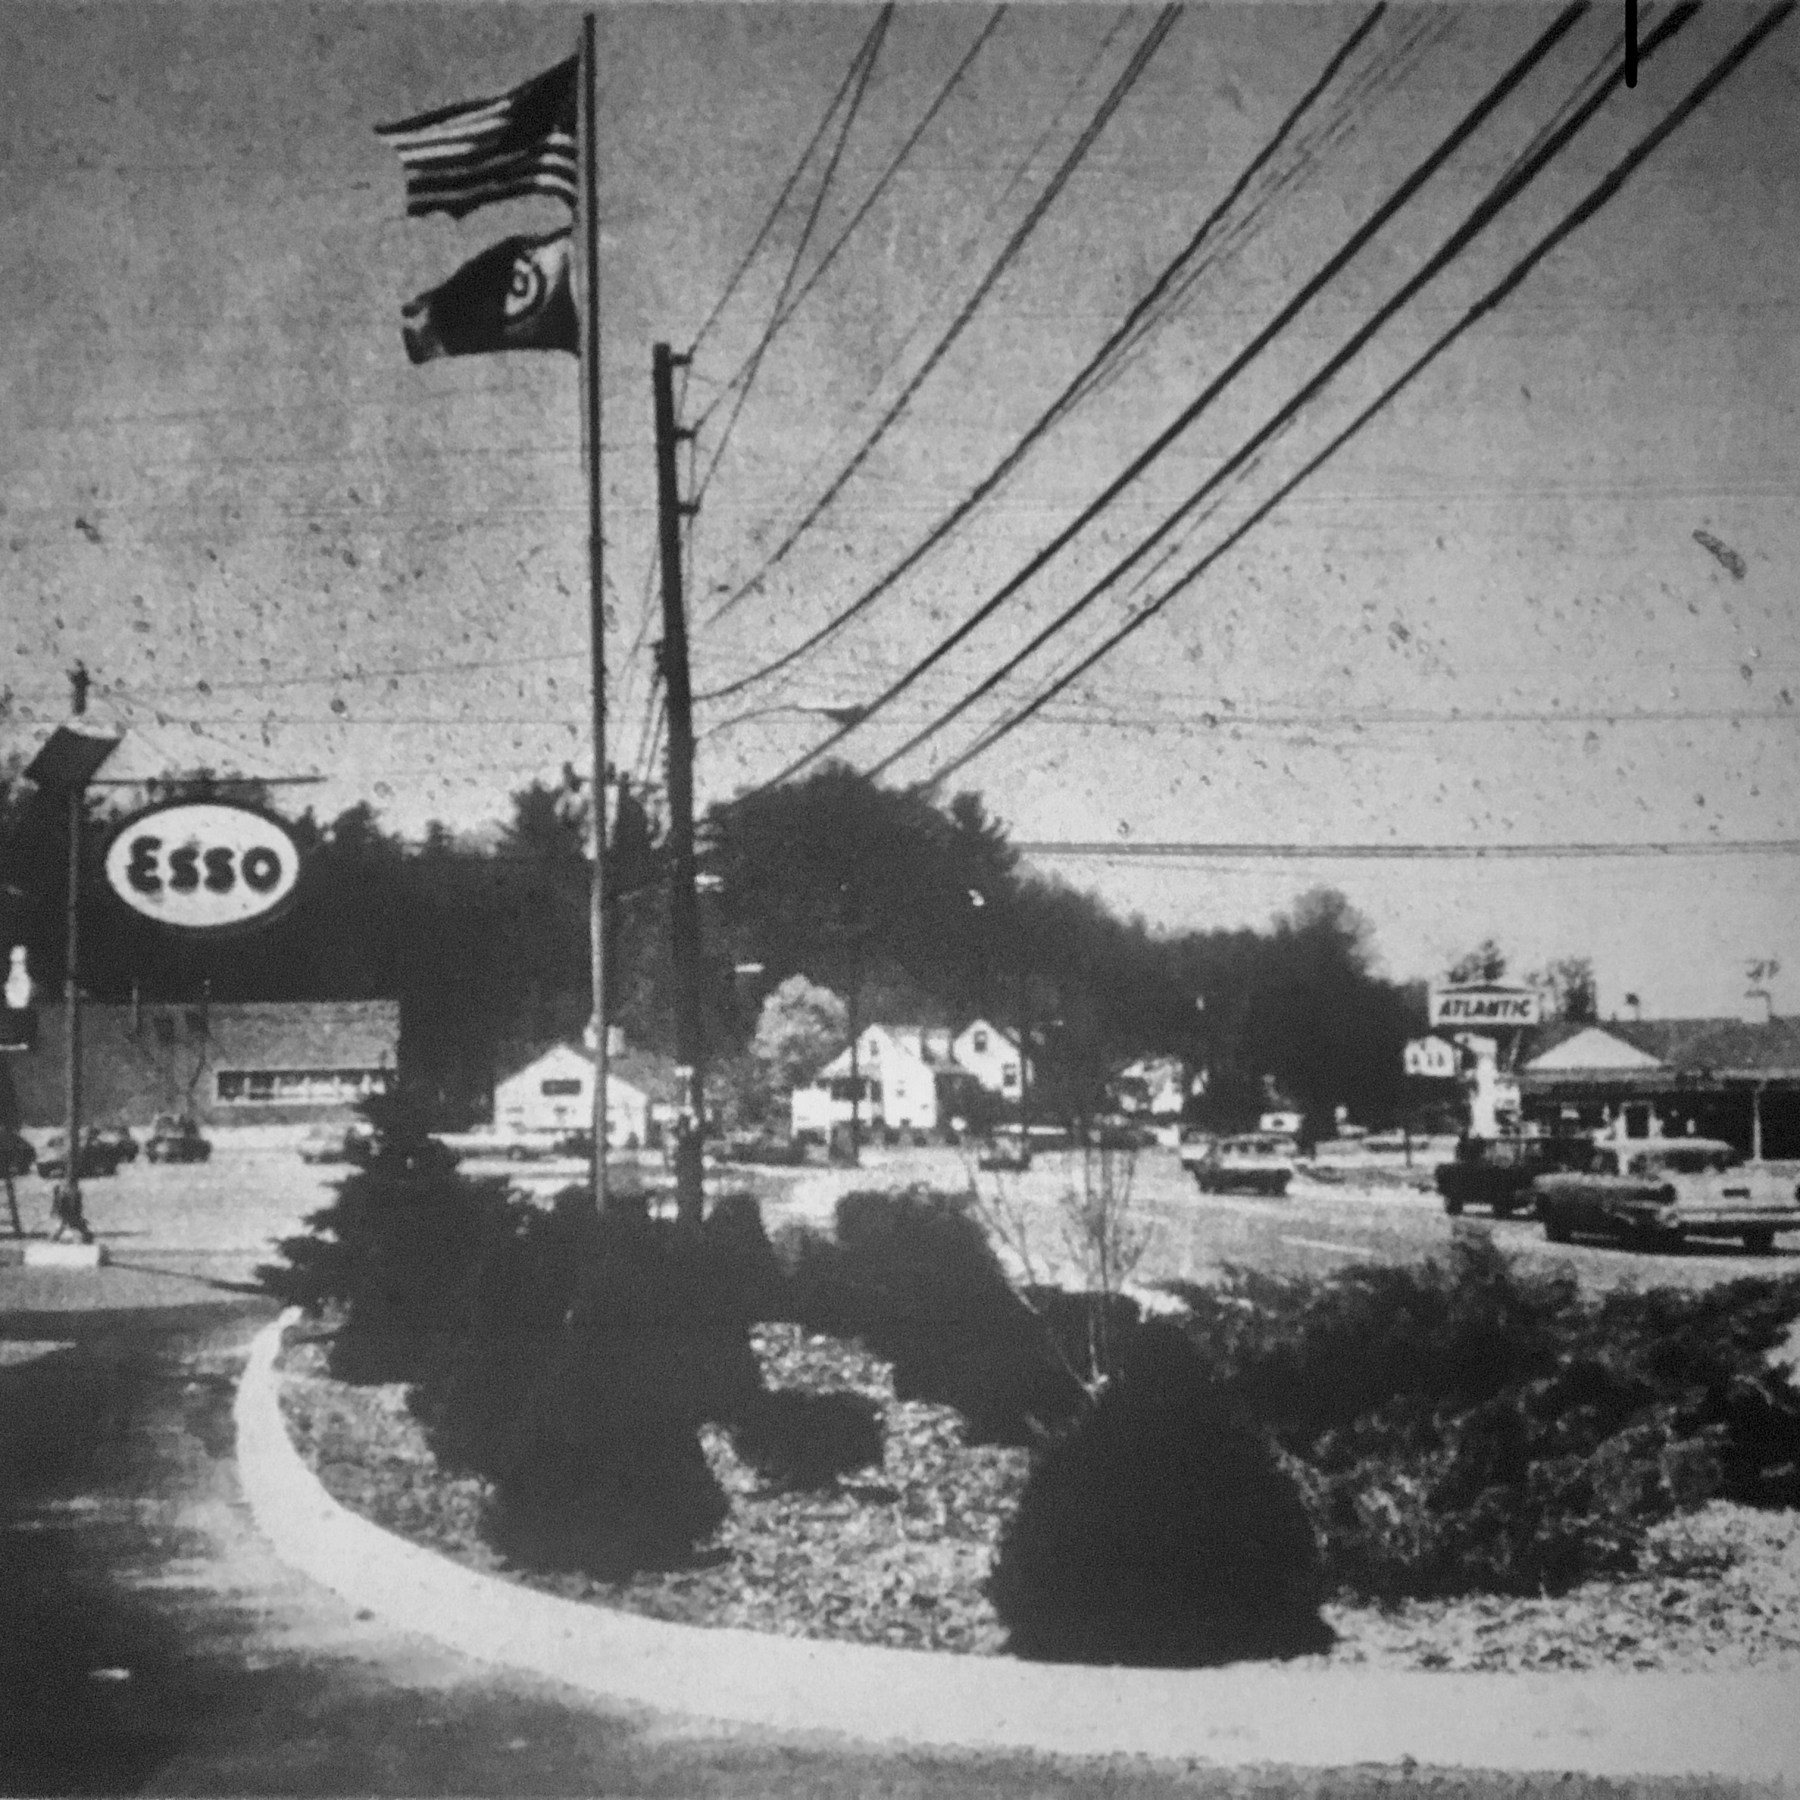 Esso and Atlantic Burlington MA